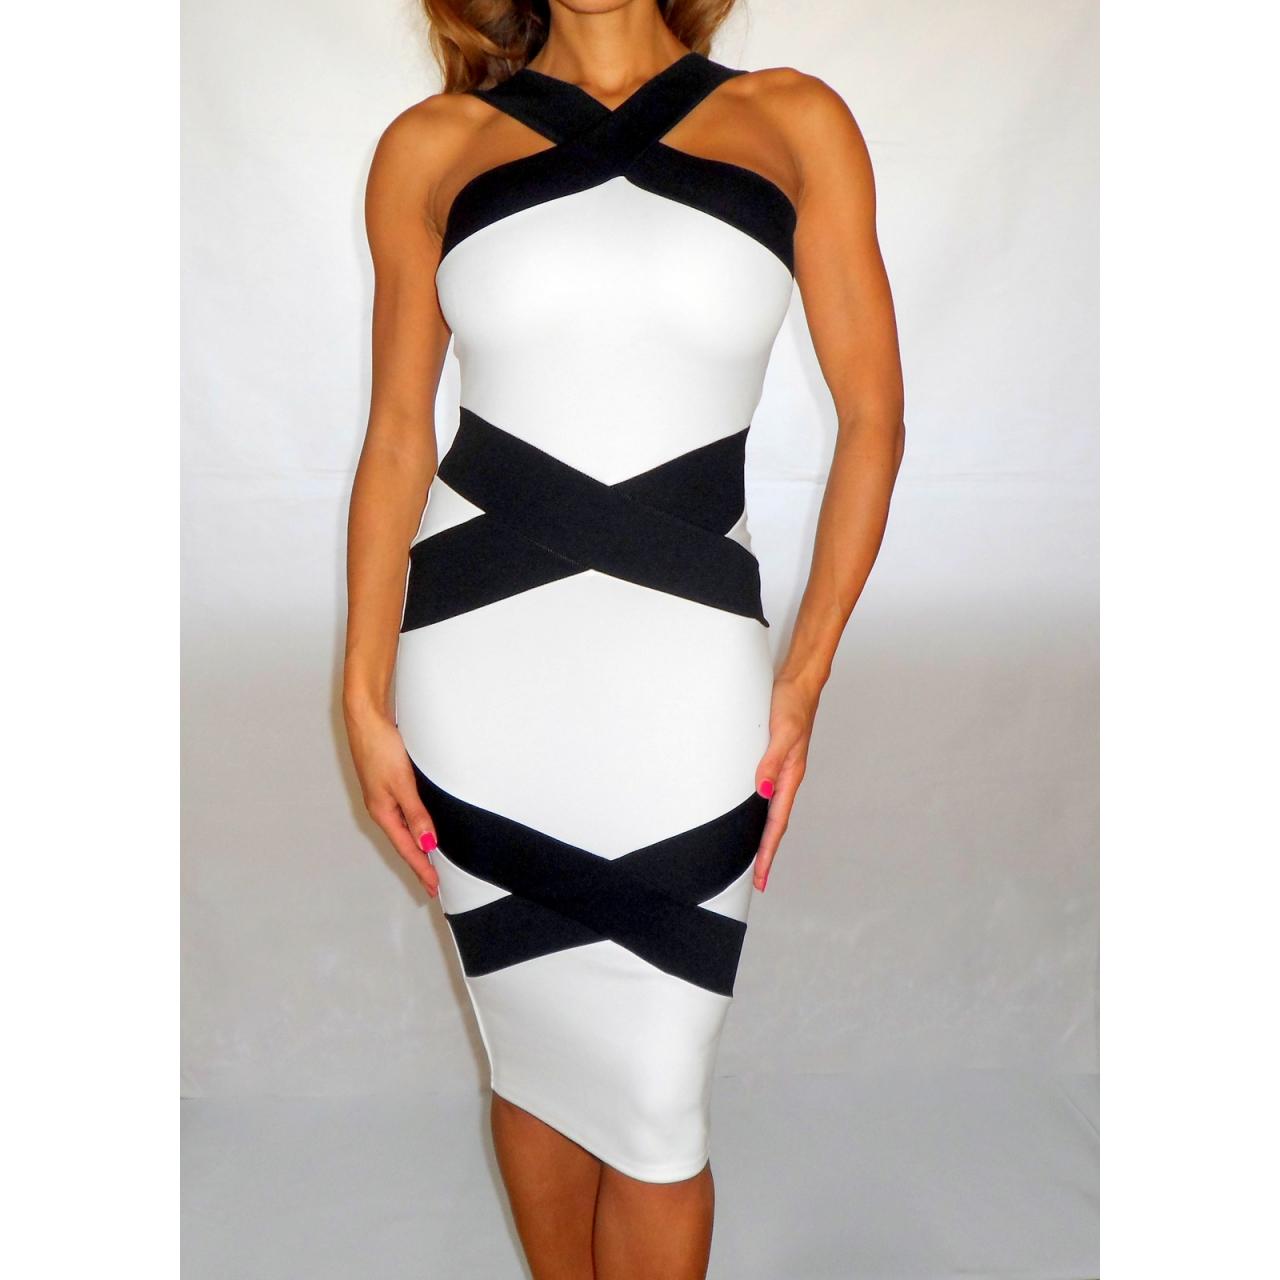 a741579e Black & White Optical Illusion Bandage Style Bodycon Dress - Rocka Frock